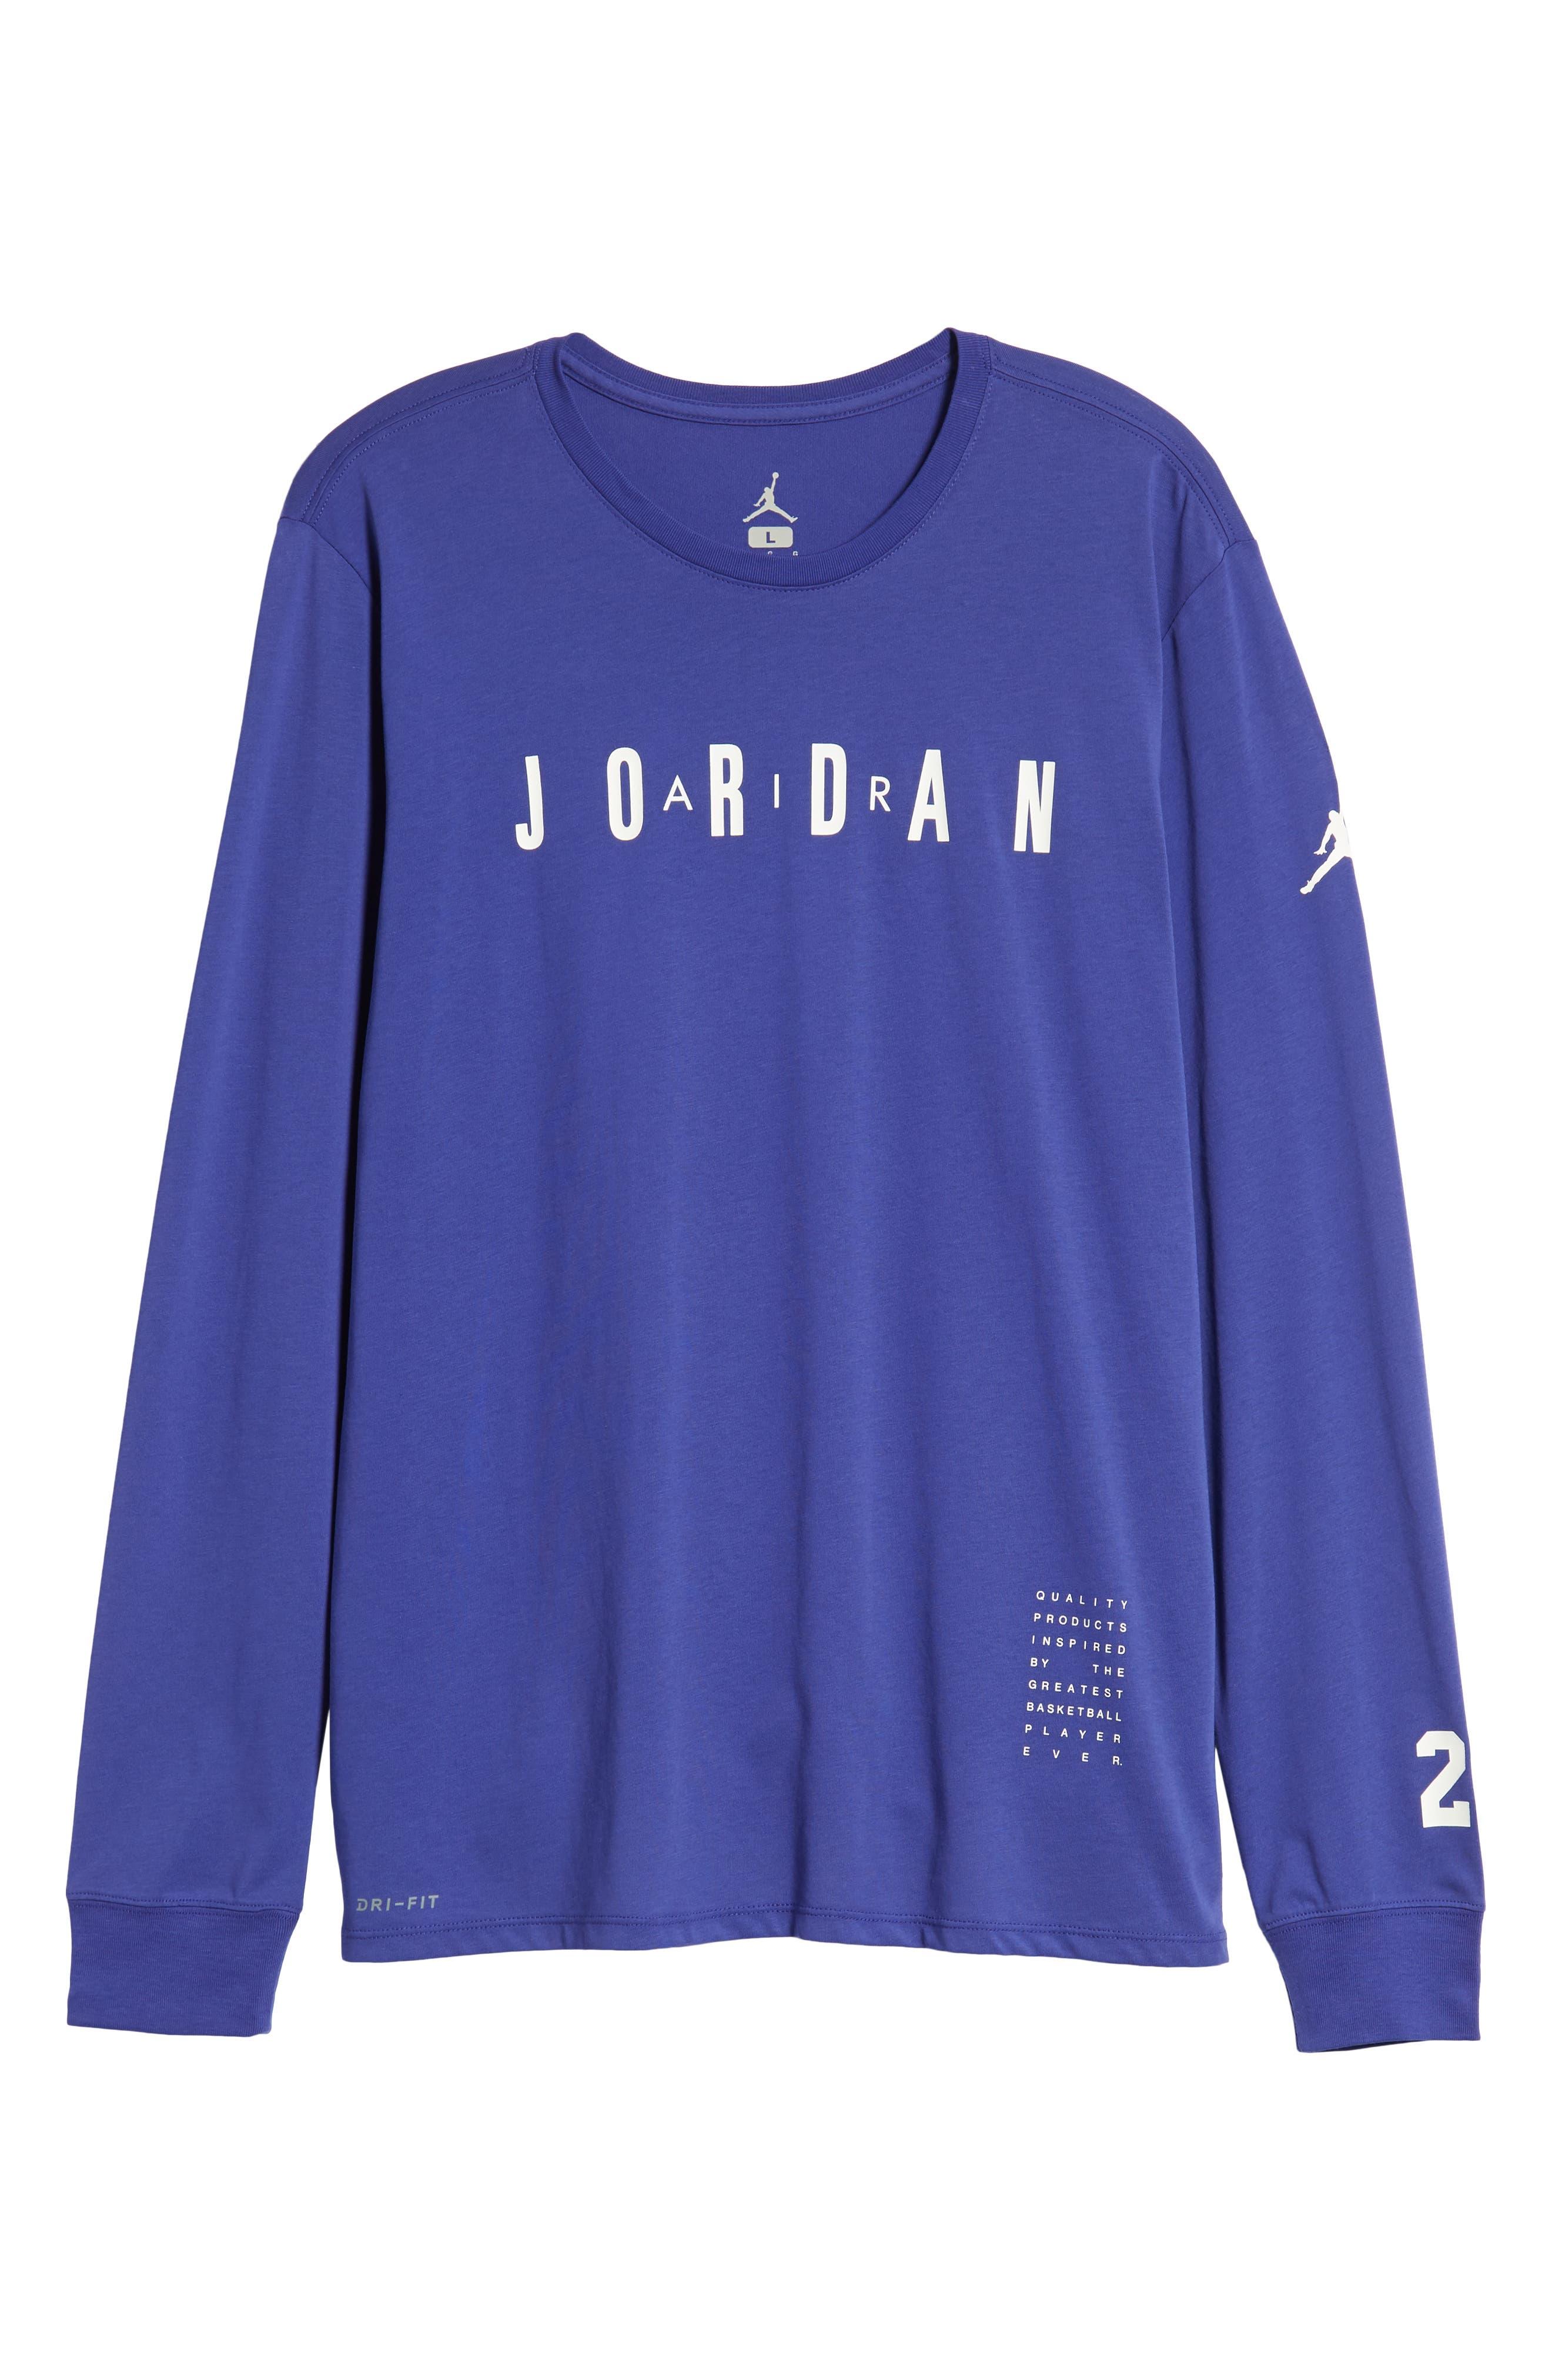 Basketball T-Shirt,                             Alternate thumbnail 6, color,                             BLUE